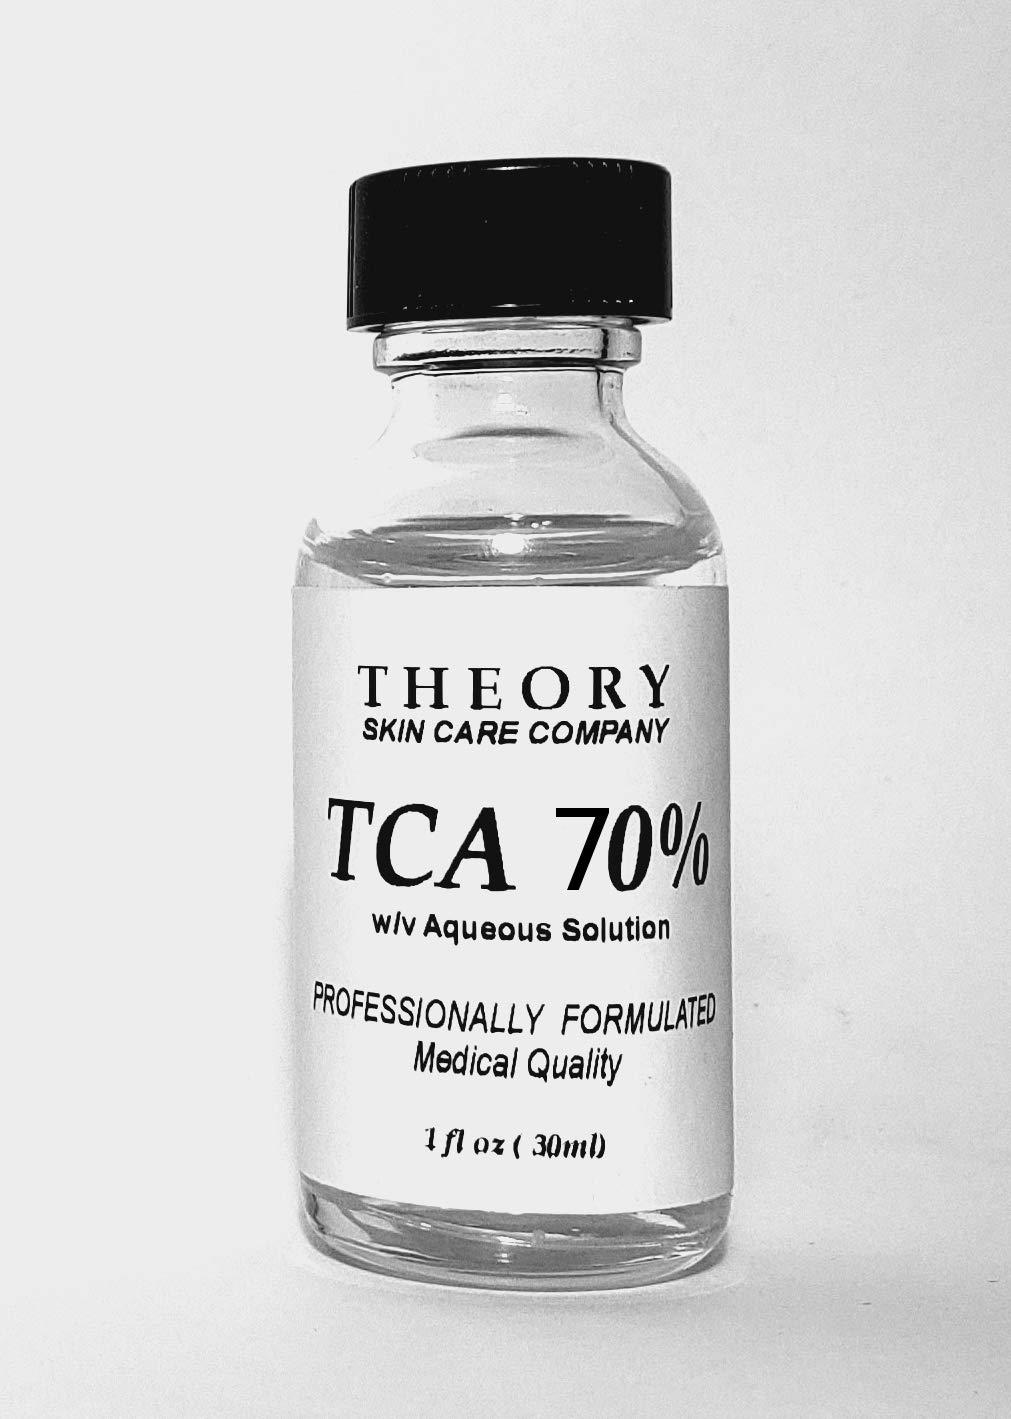 Trichloroacetic Acid 70% TCA Chemical Peel, 1 oz, Medical Grade, Wrinkles, Fine Lines, Freckles, Scars, Age spots